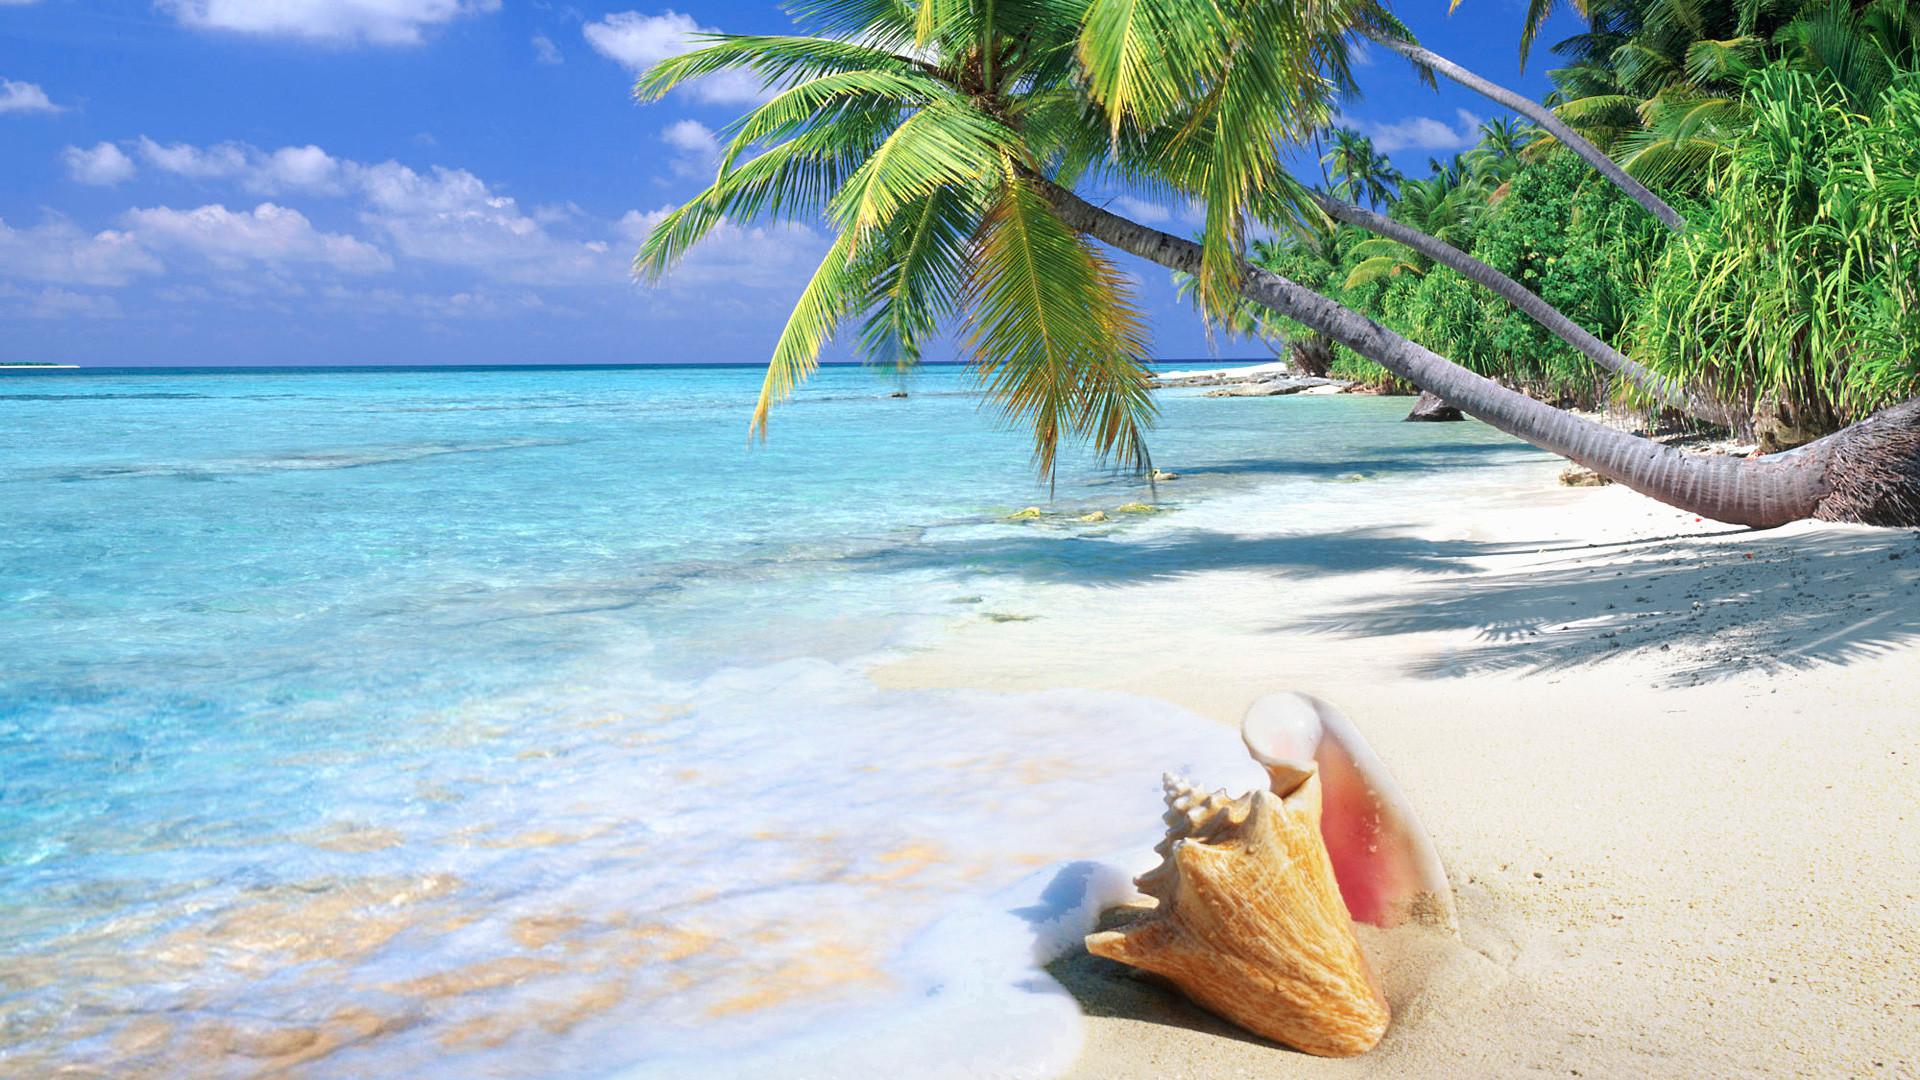 Beach 4K Ultra HD Wallpaper Download, Aleshia Foley